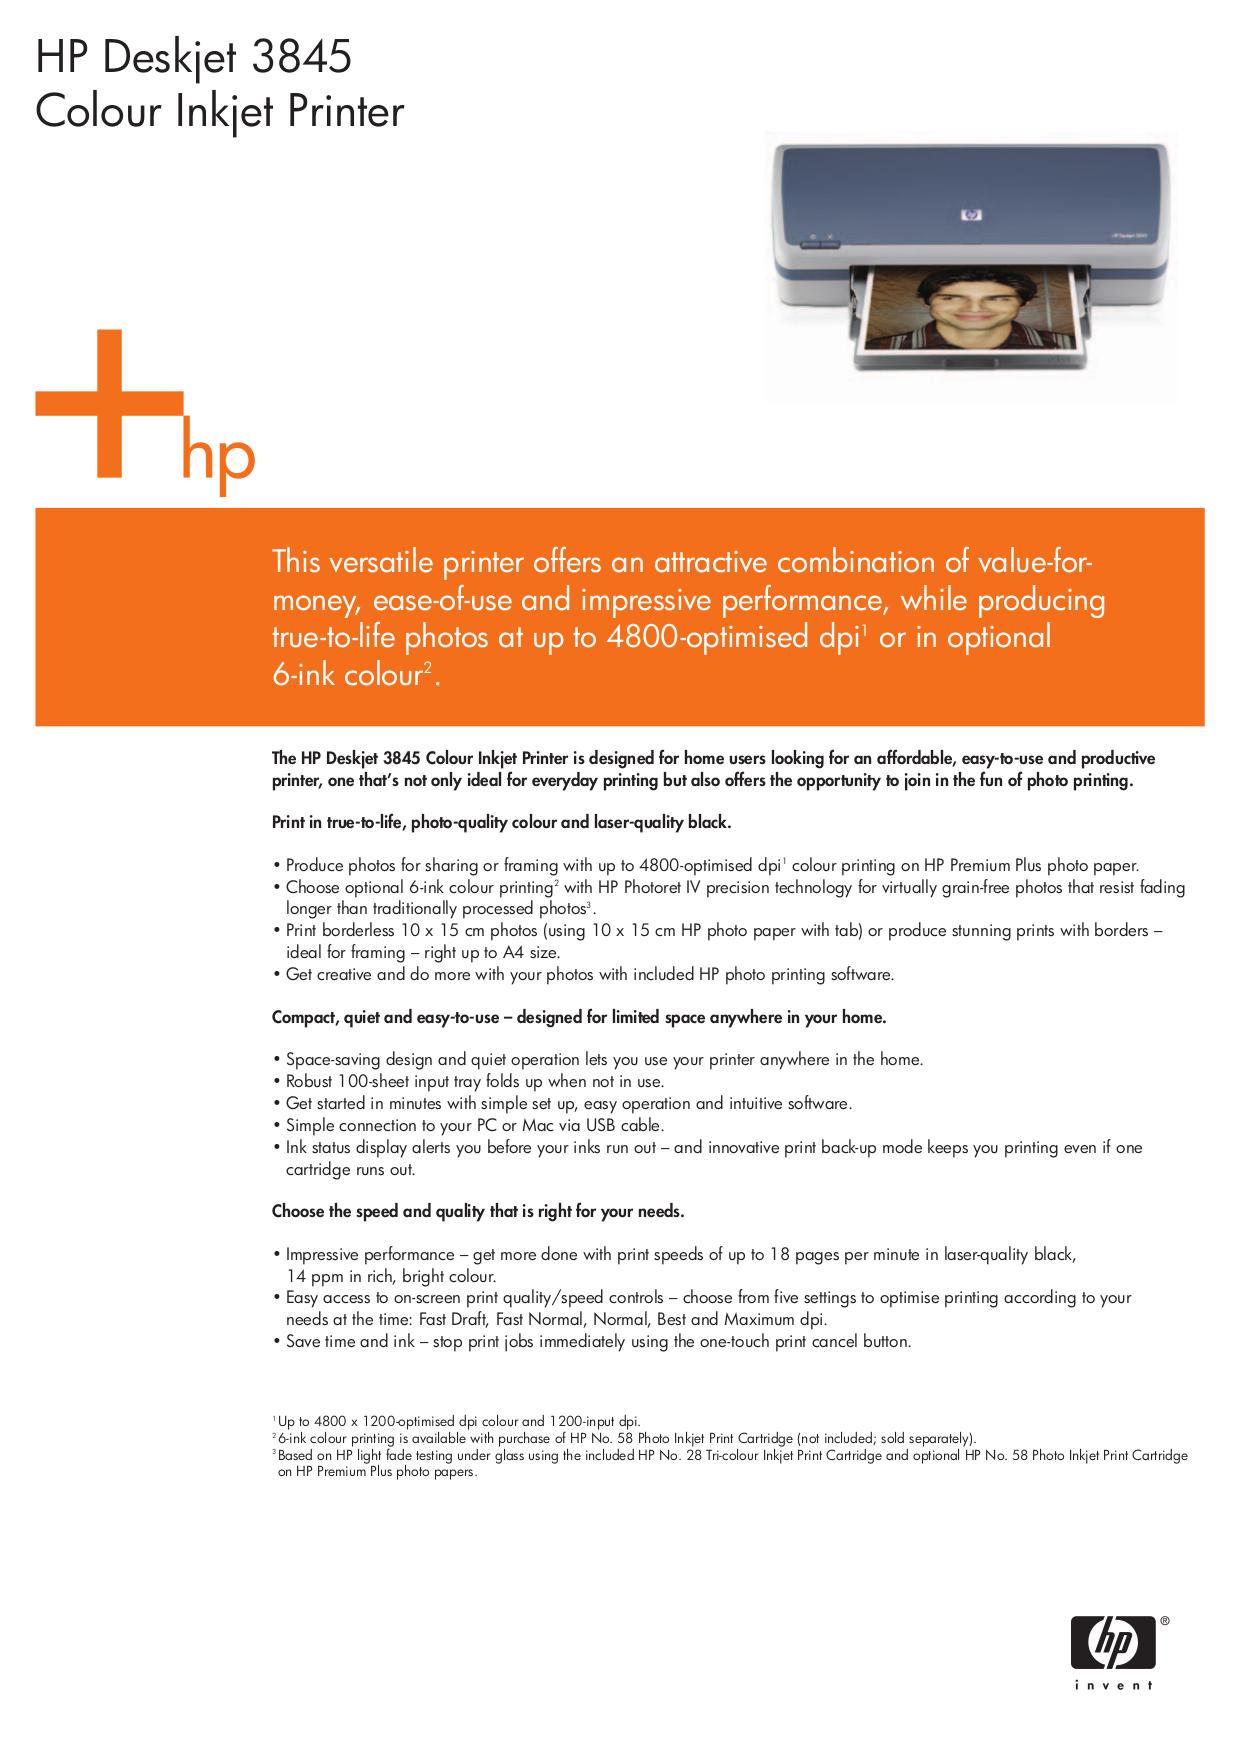 download free pdf for hp deskjet 3845 printer manual rh umlib com hp deskjet 3845 user manual HP Deskjet 6940